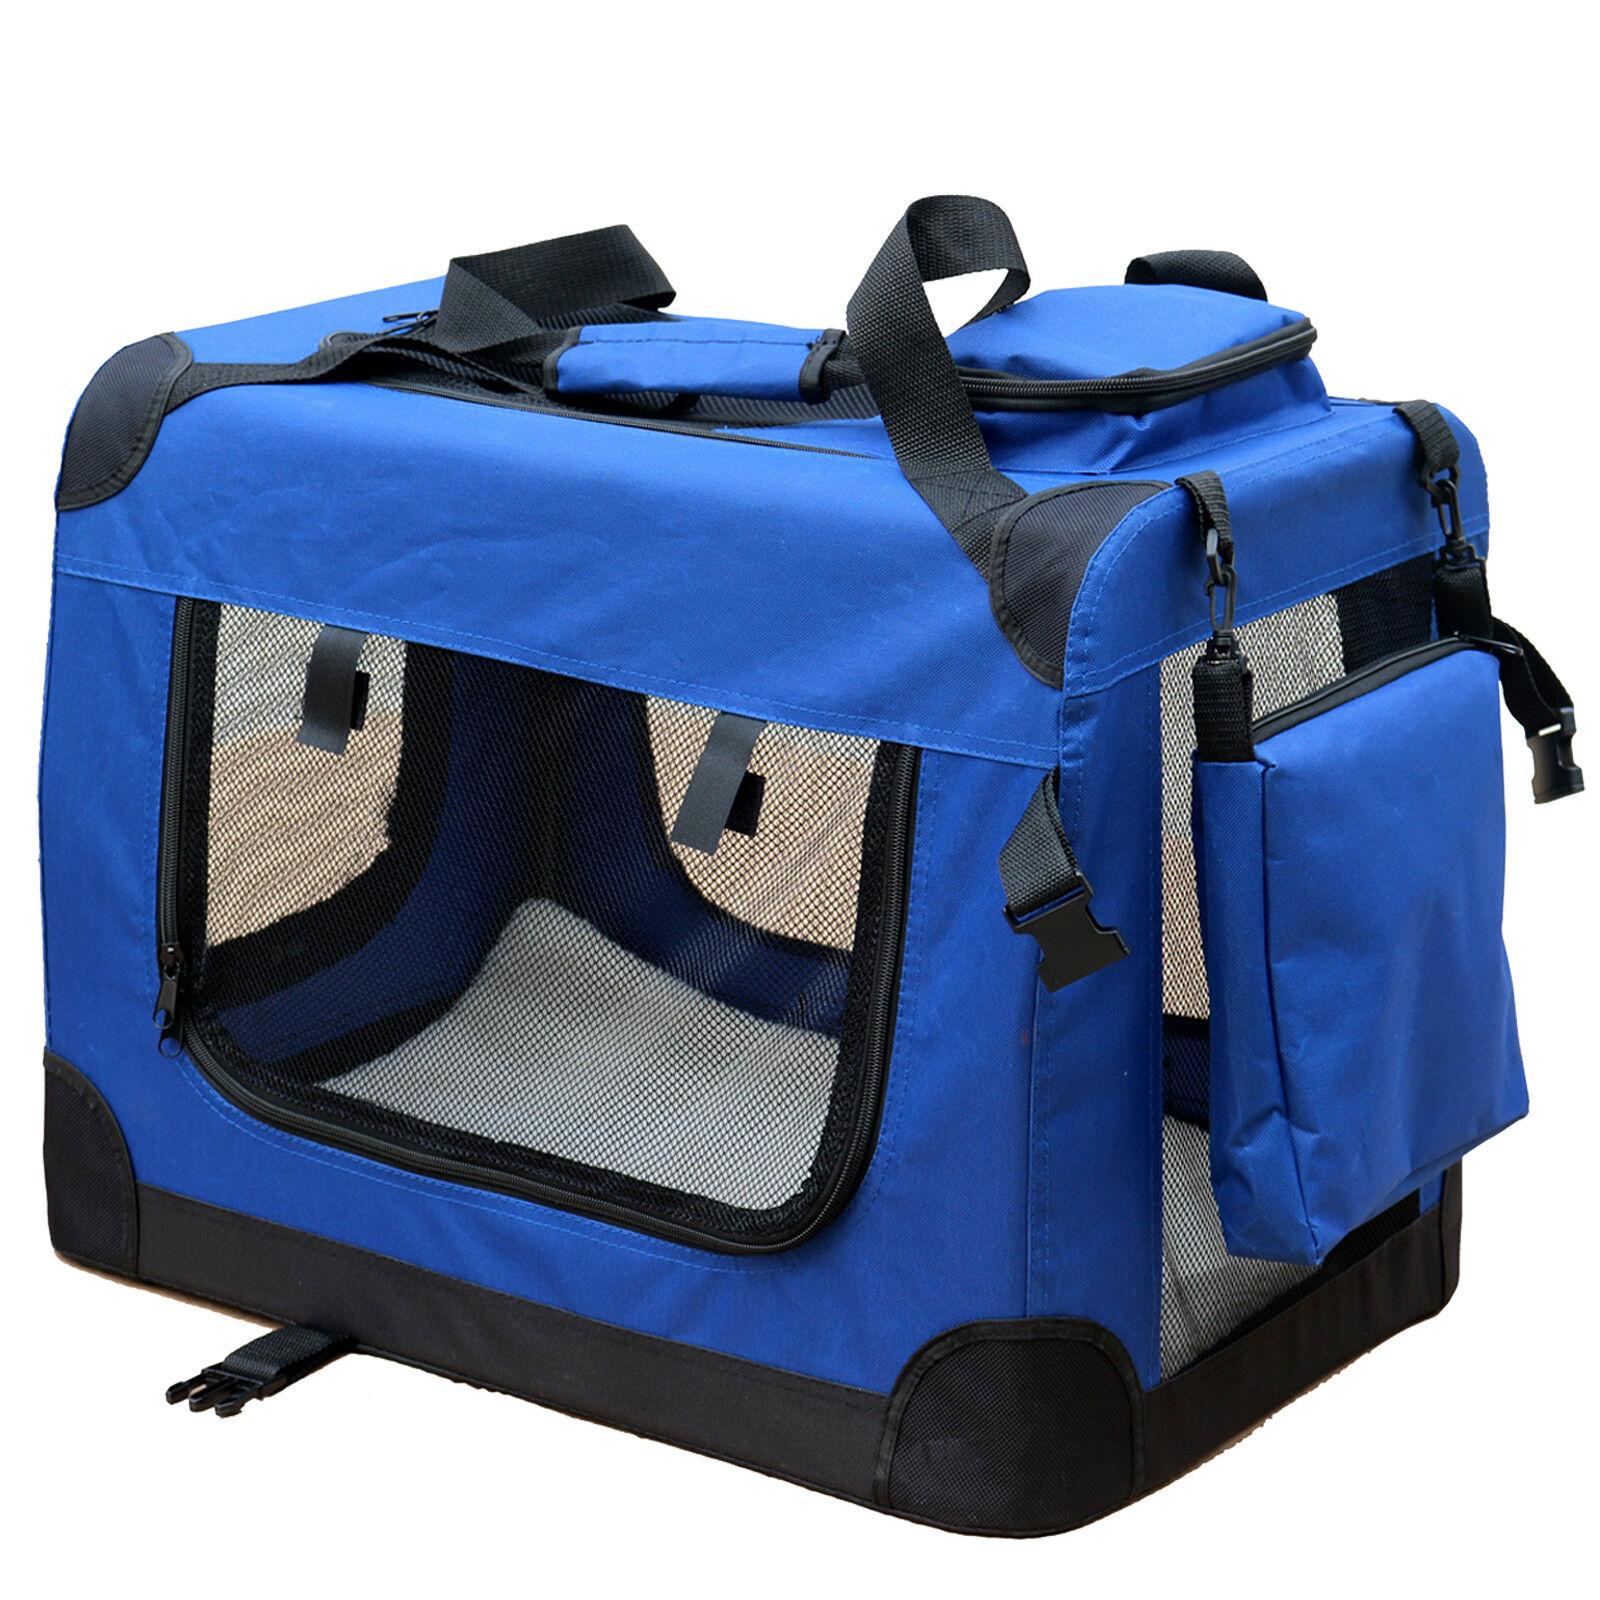 hundebox hundetransportbox transportbox reisebox auto hunde katze box xl blau ebay. Black Bedroom Furniture Sets. Home Design Ideas